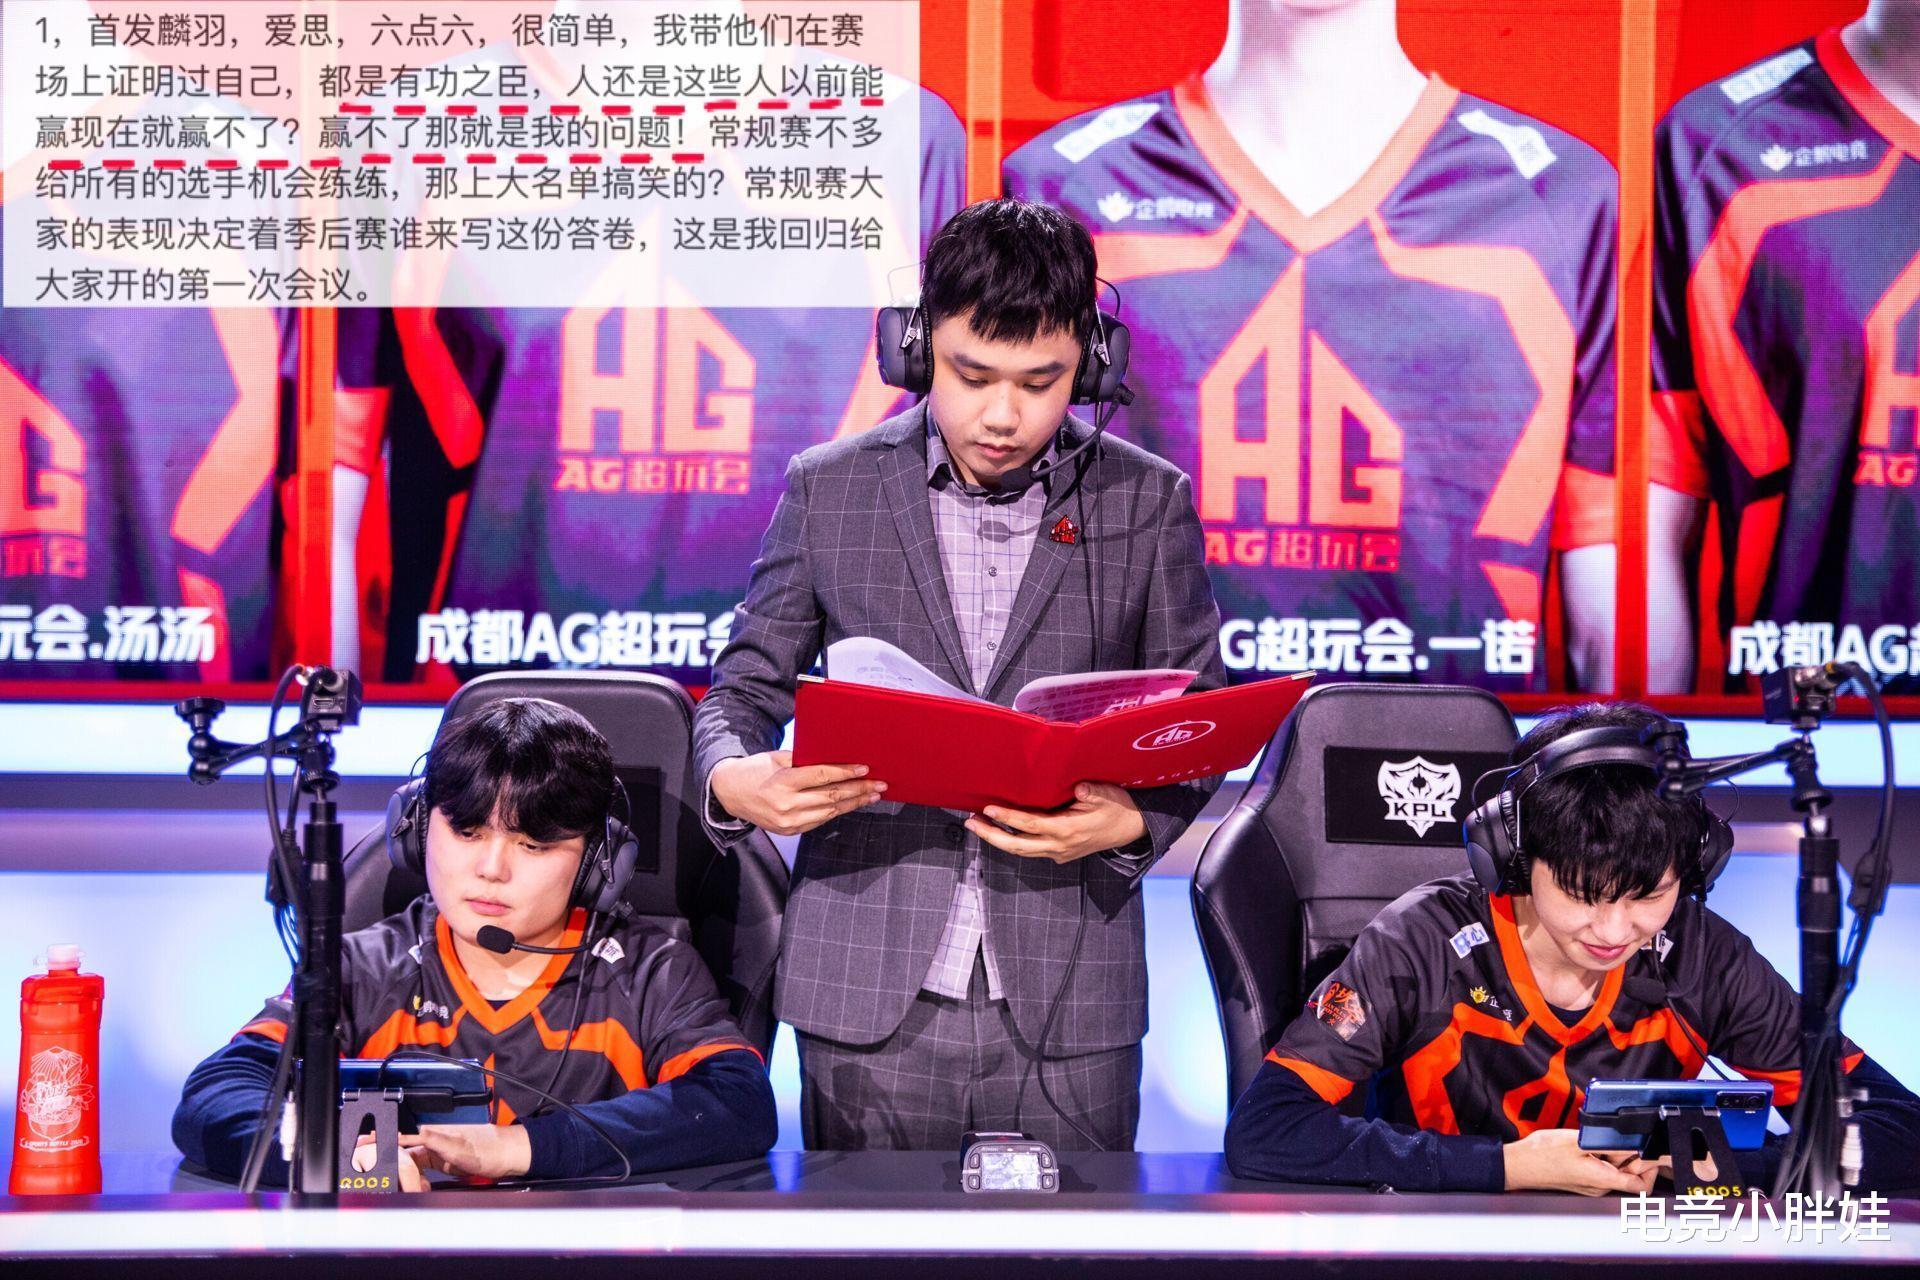 AG超玩会出最强阵容对战GK,月光用16个字说明一切,他尊重每一个对手